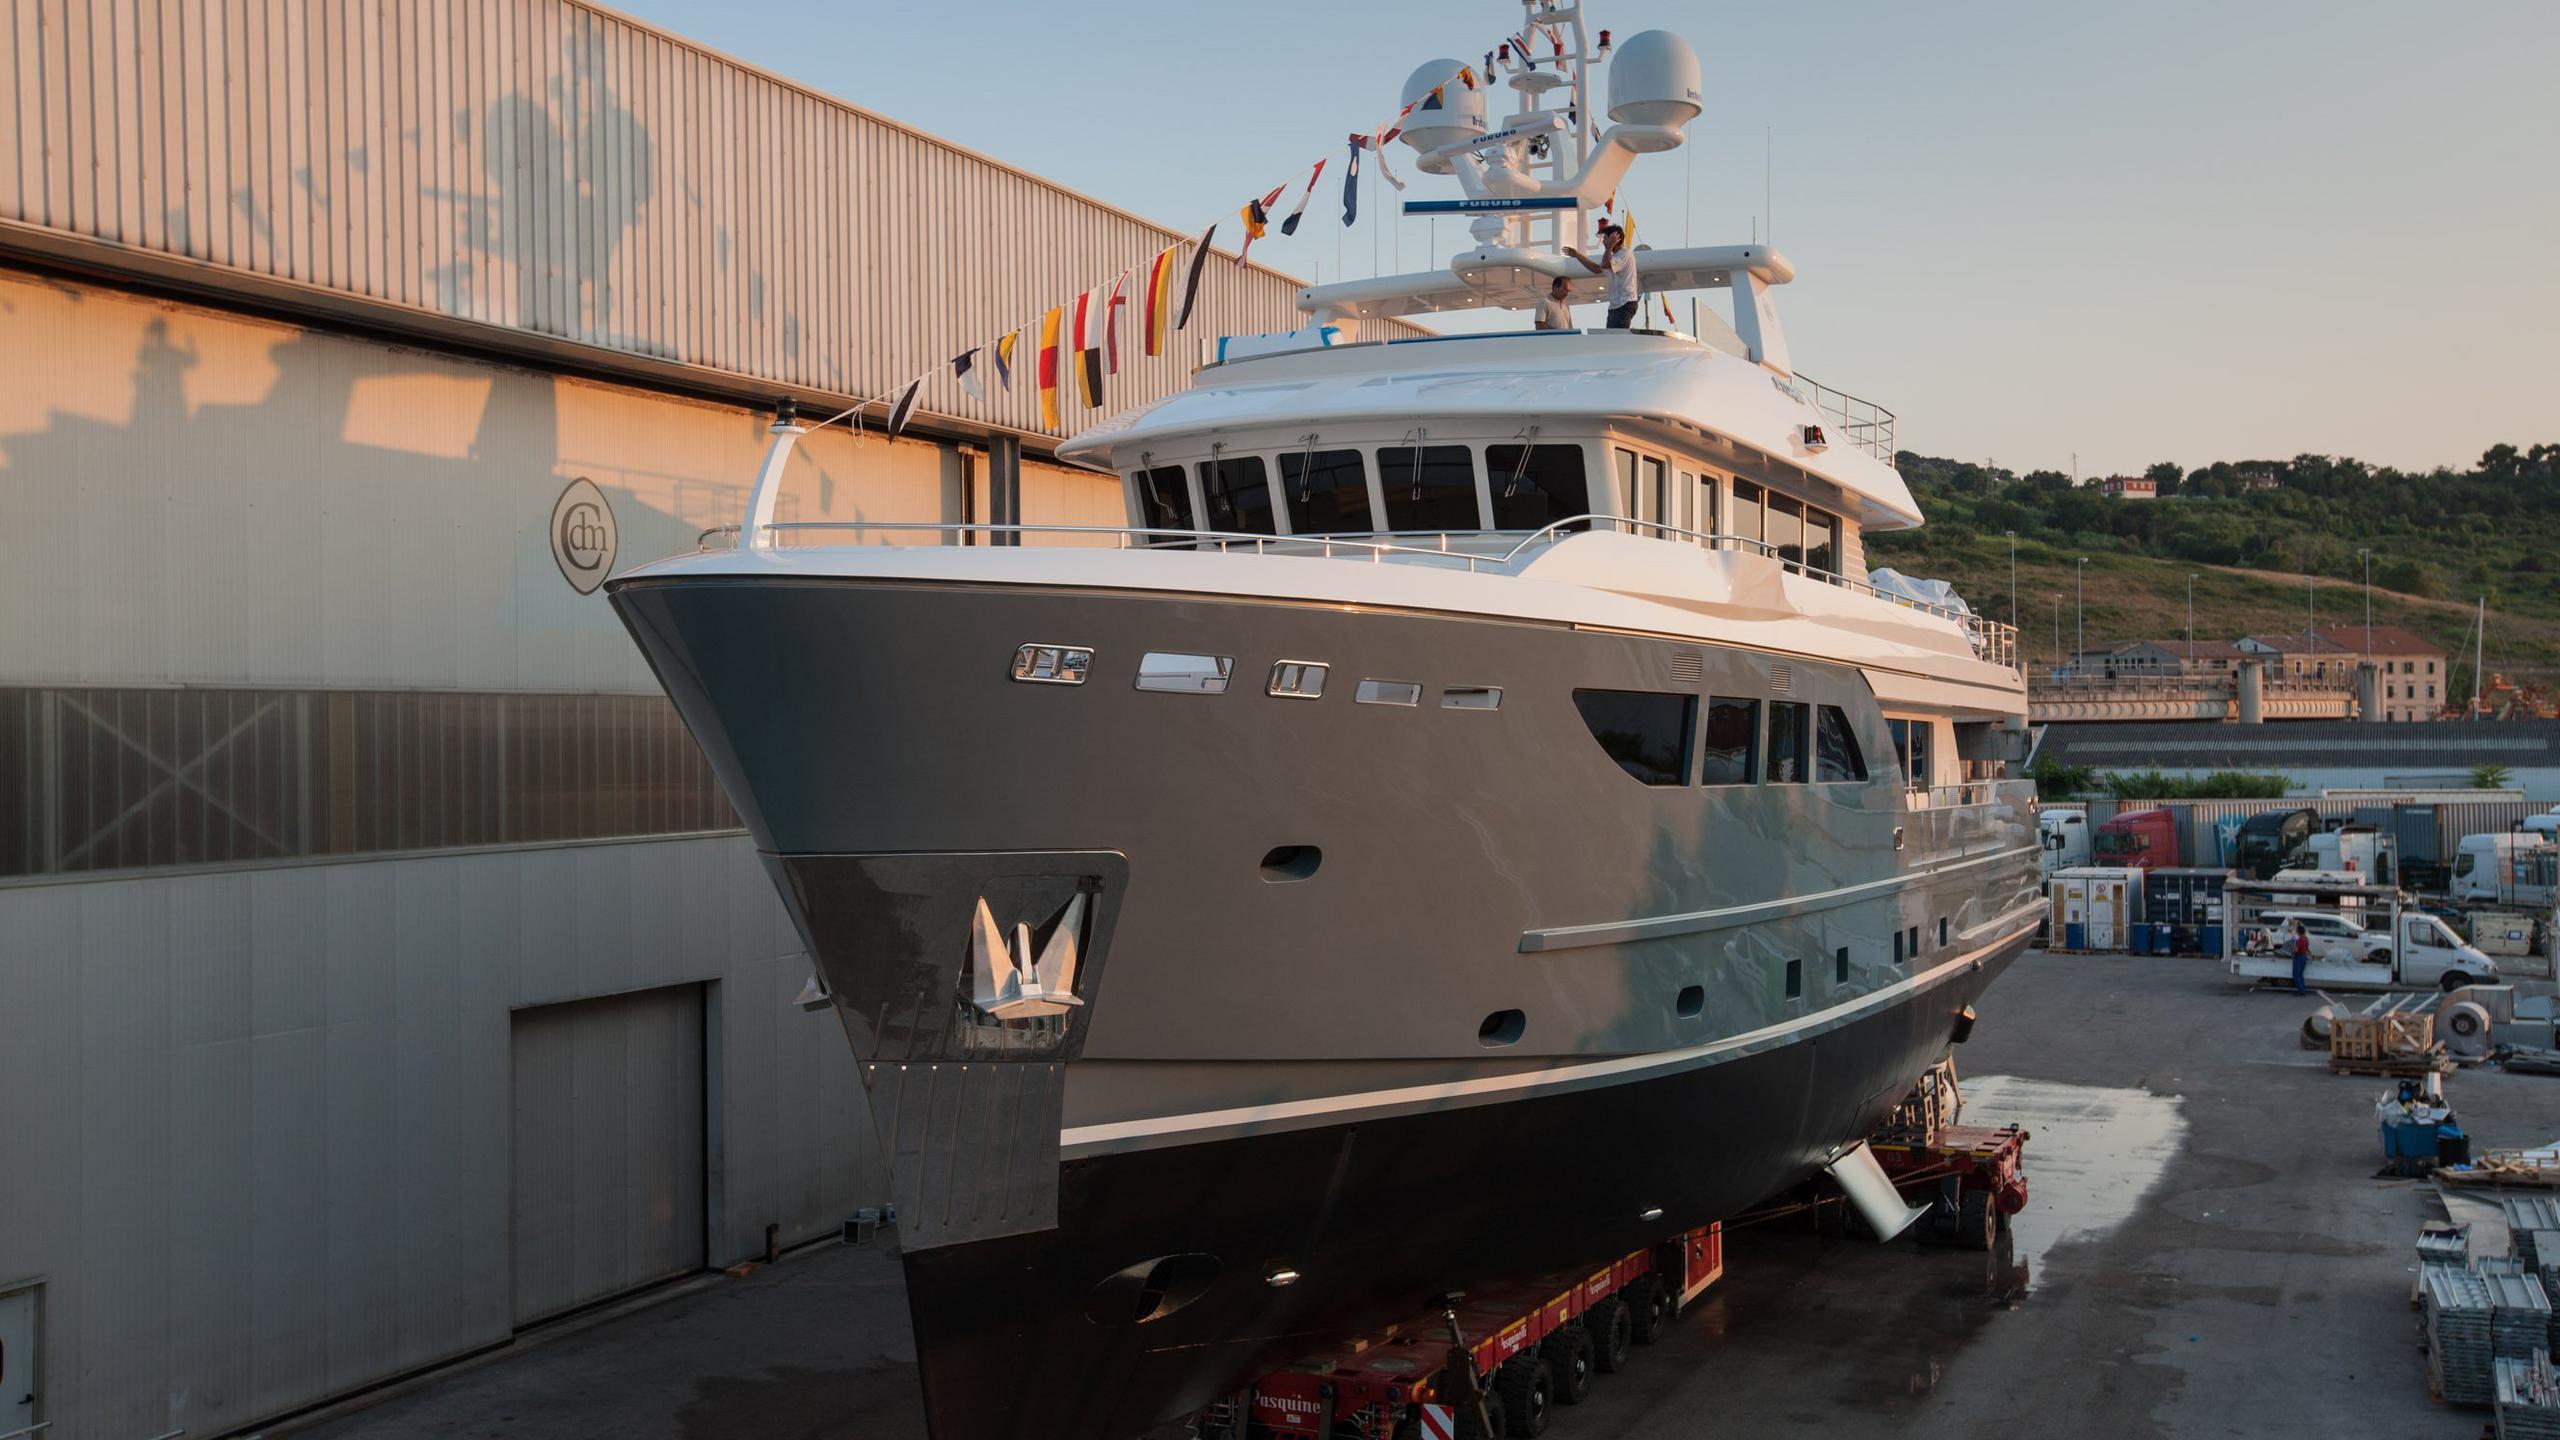 storm-motor-yacht-cantiere-dell-marche-darwin-107-2015-33m-shipyard